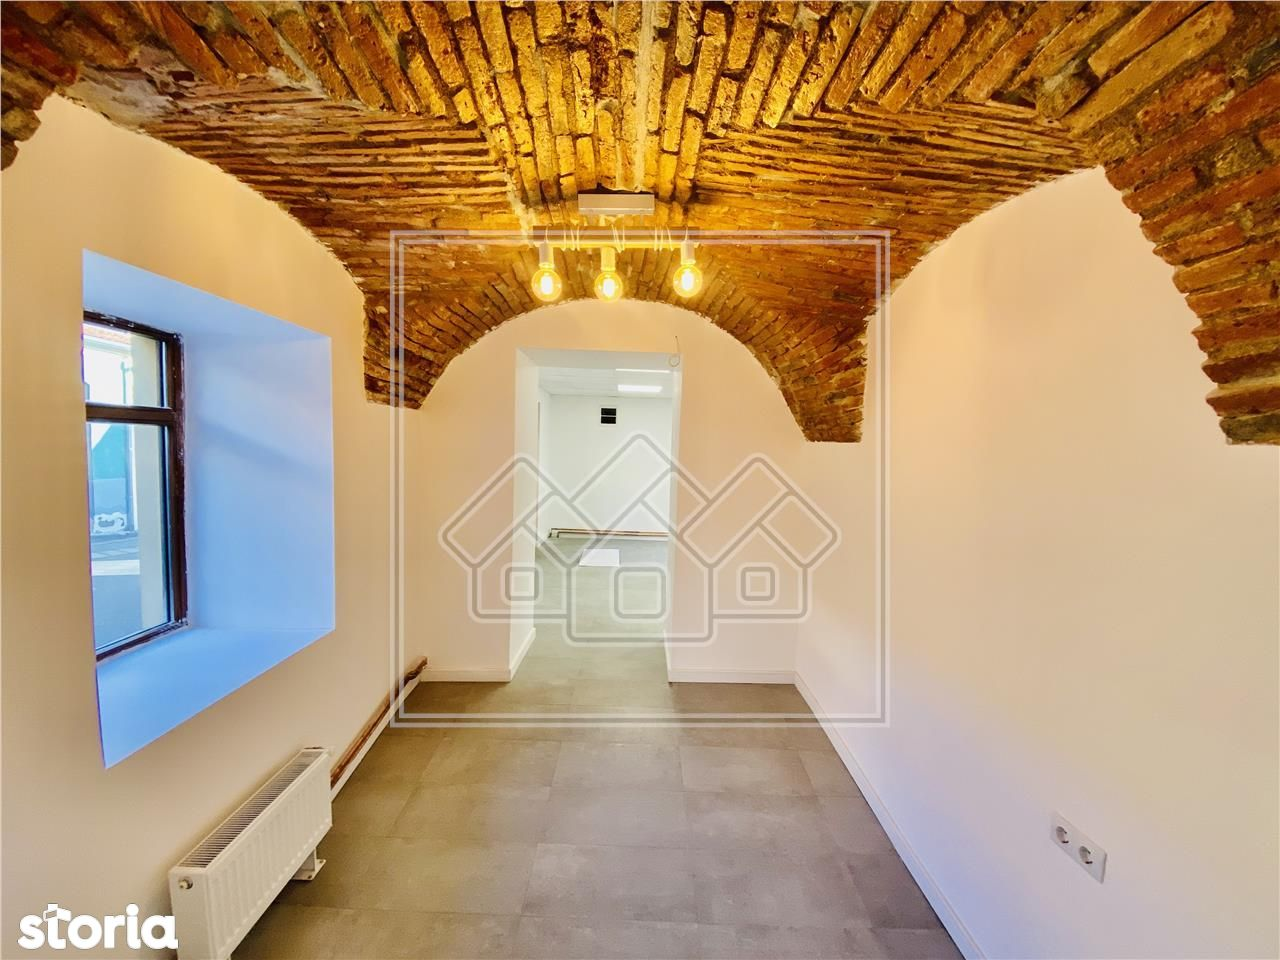 Spatiu recent renovat, 76 mp utili situat in zona Ultracentrala